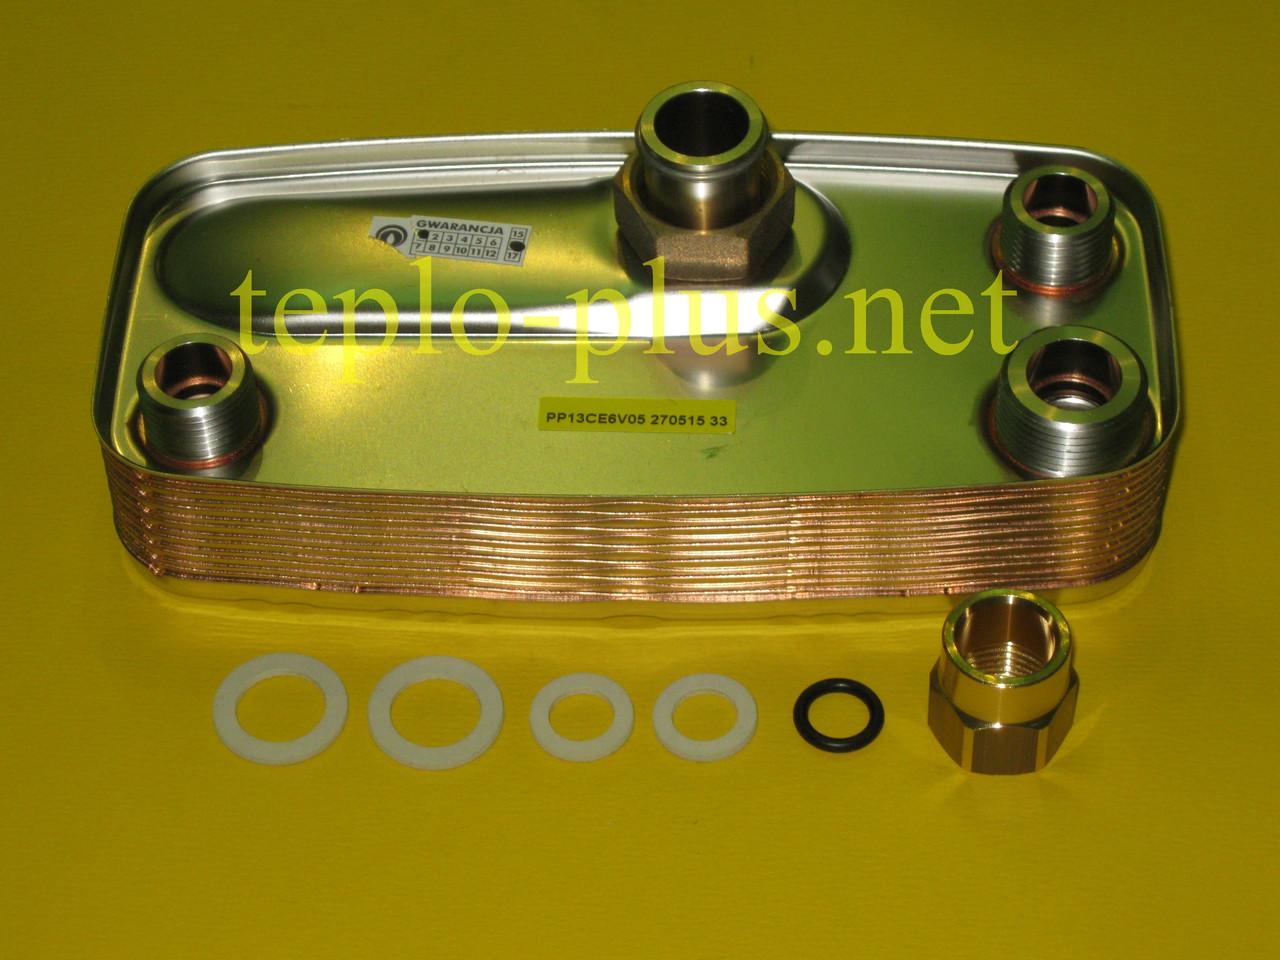 Теплообменник mini Пластины теплообменника SWEP (Росвеп) GC-51N Киров